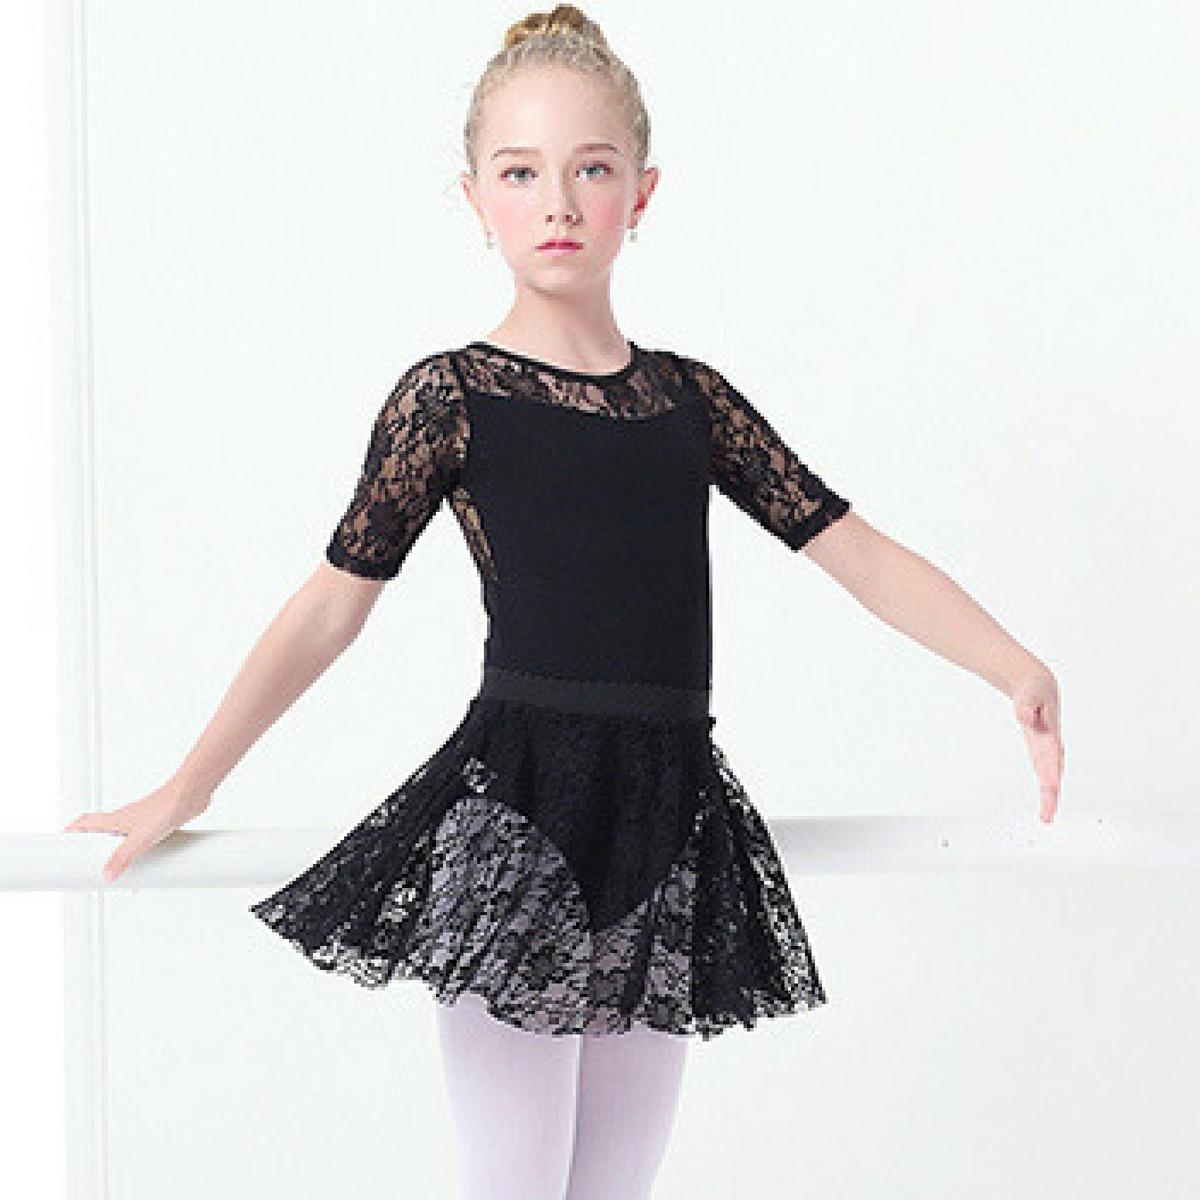 c7b5e5645 ballet roupa vestido para aulas de bale infantil balarina. Carregando zoom.